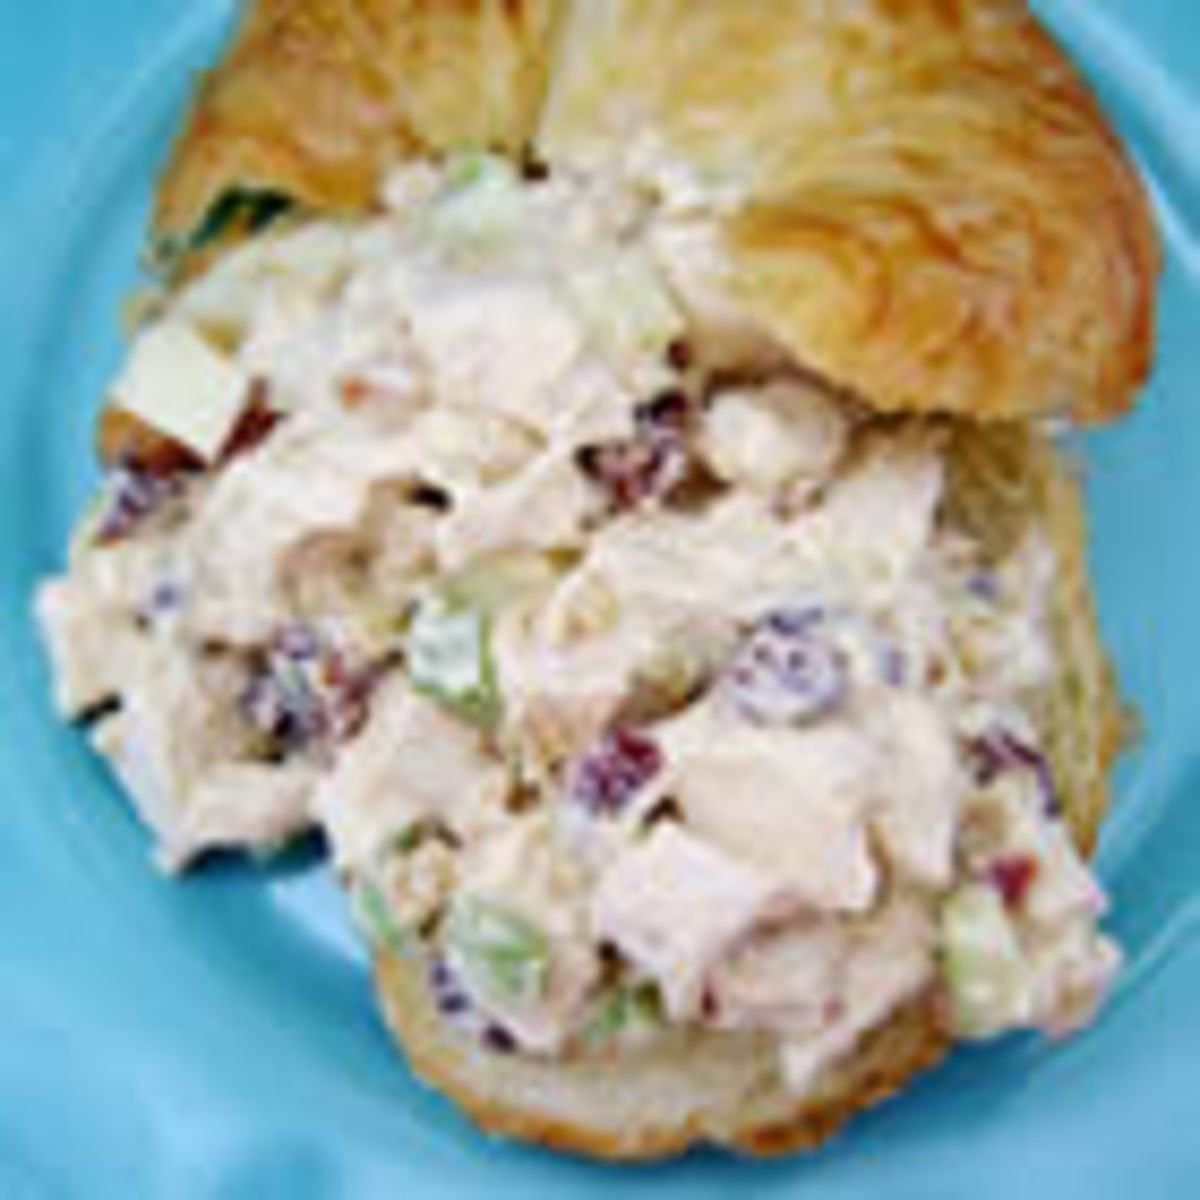 Cherry Chicken Salad (from Allrecipes)